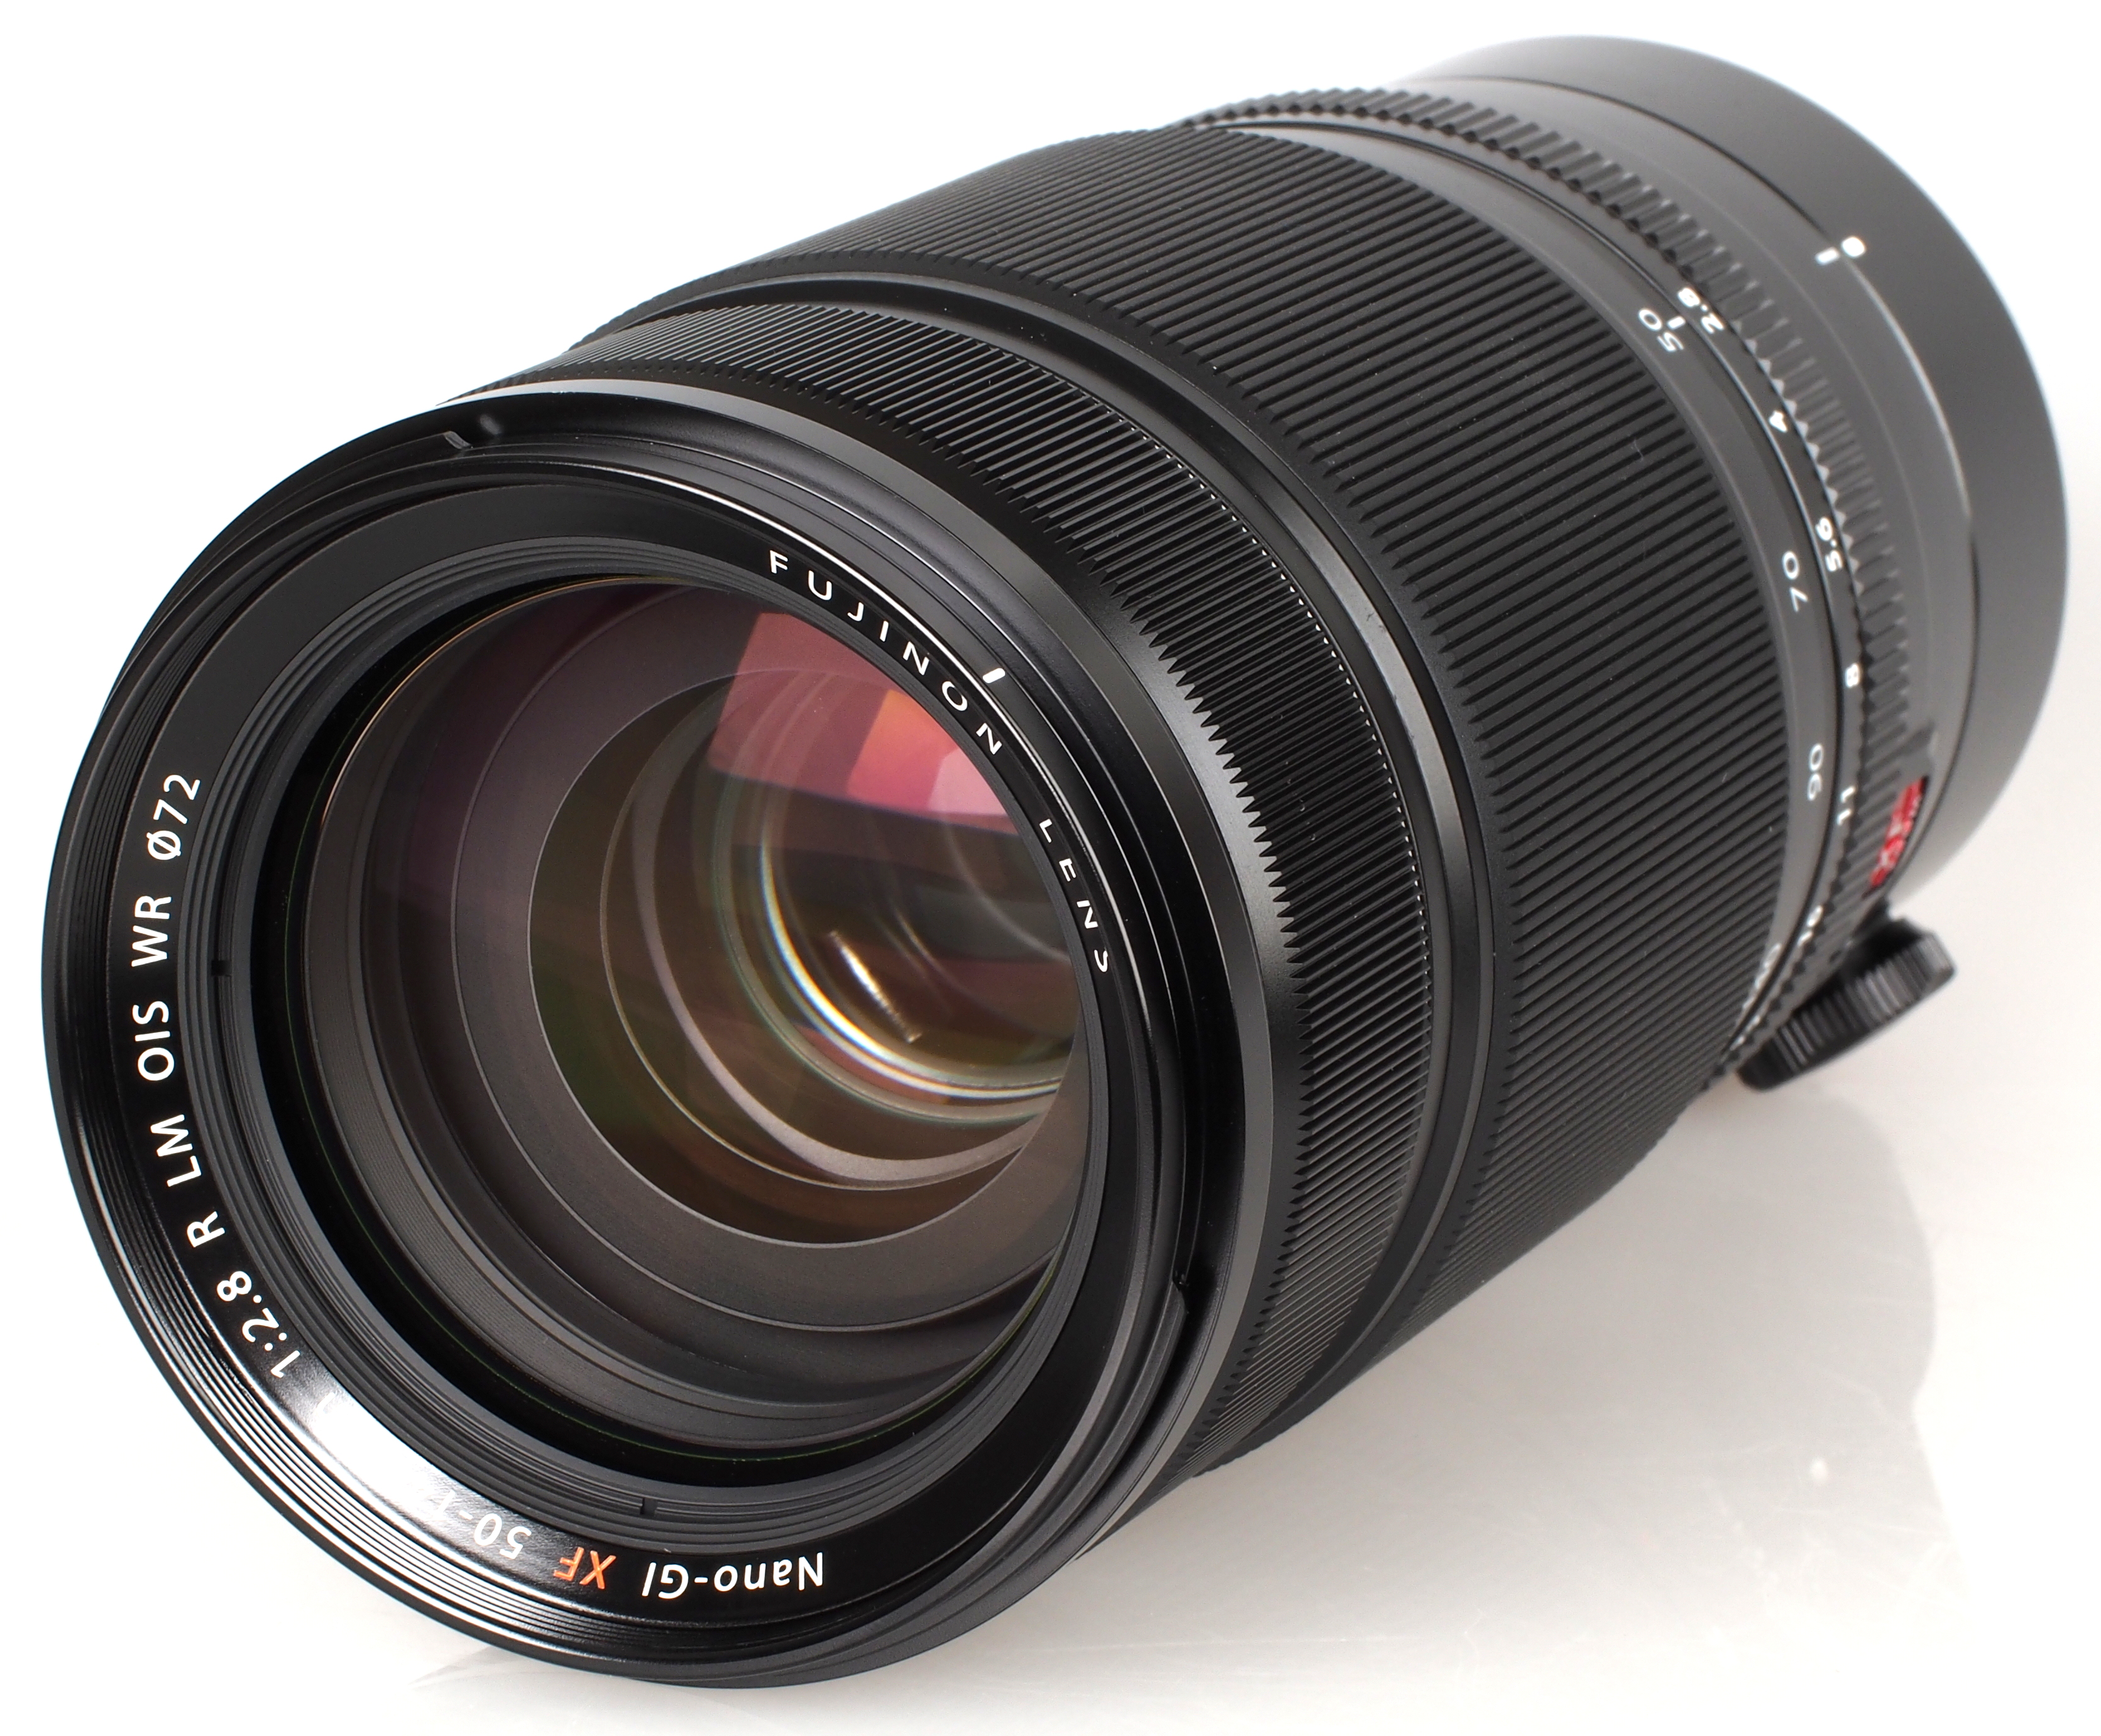 Fuji FUJINON XF50-140mm F2.8 R OIS WR